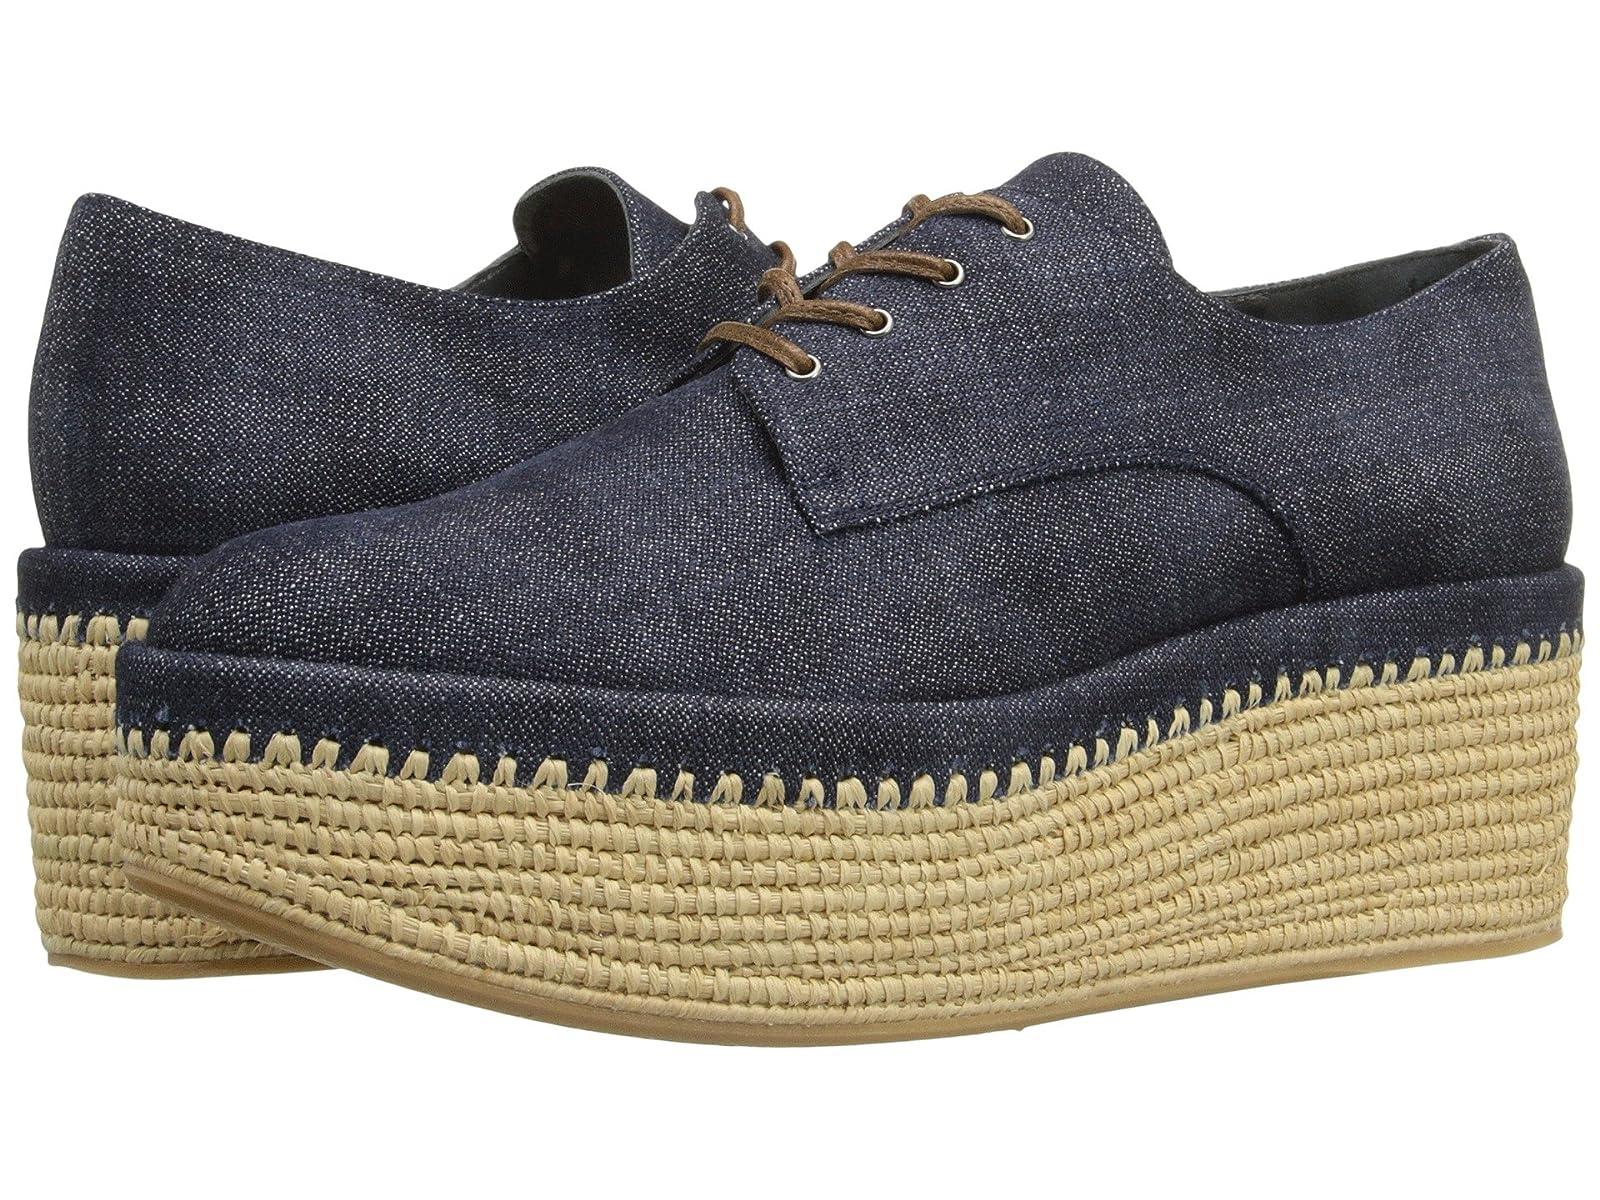 Stuart Weitzman KentCheap and distinctive eye-catching shoes